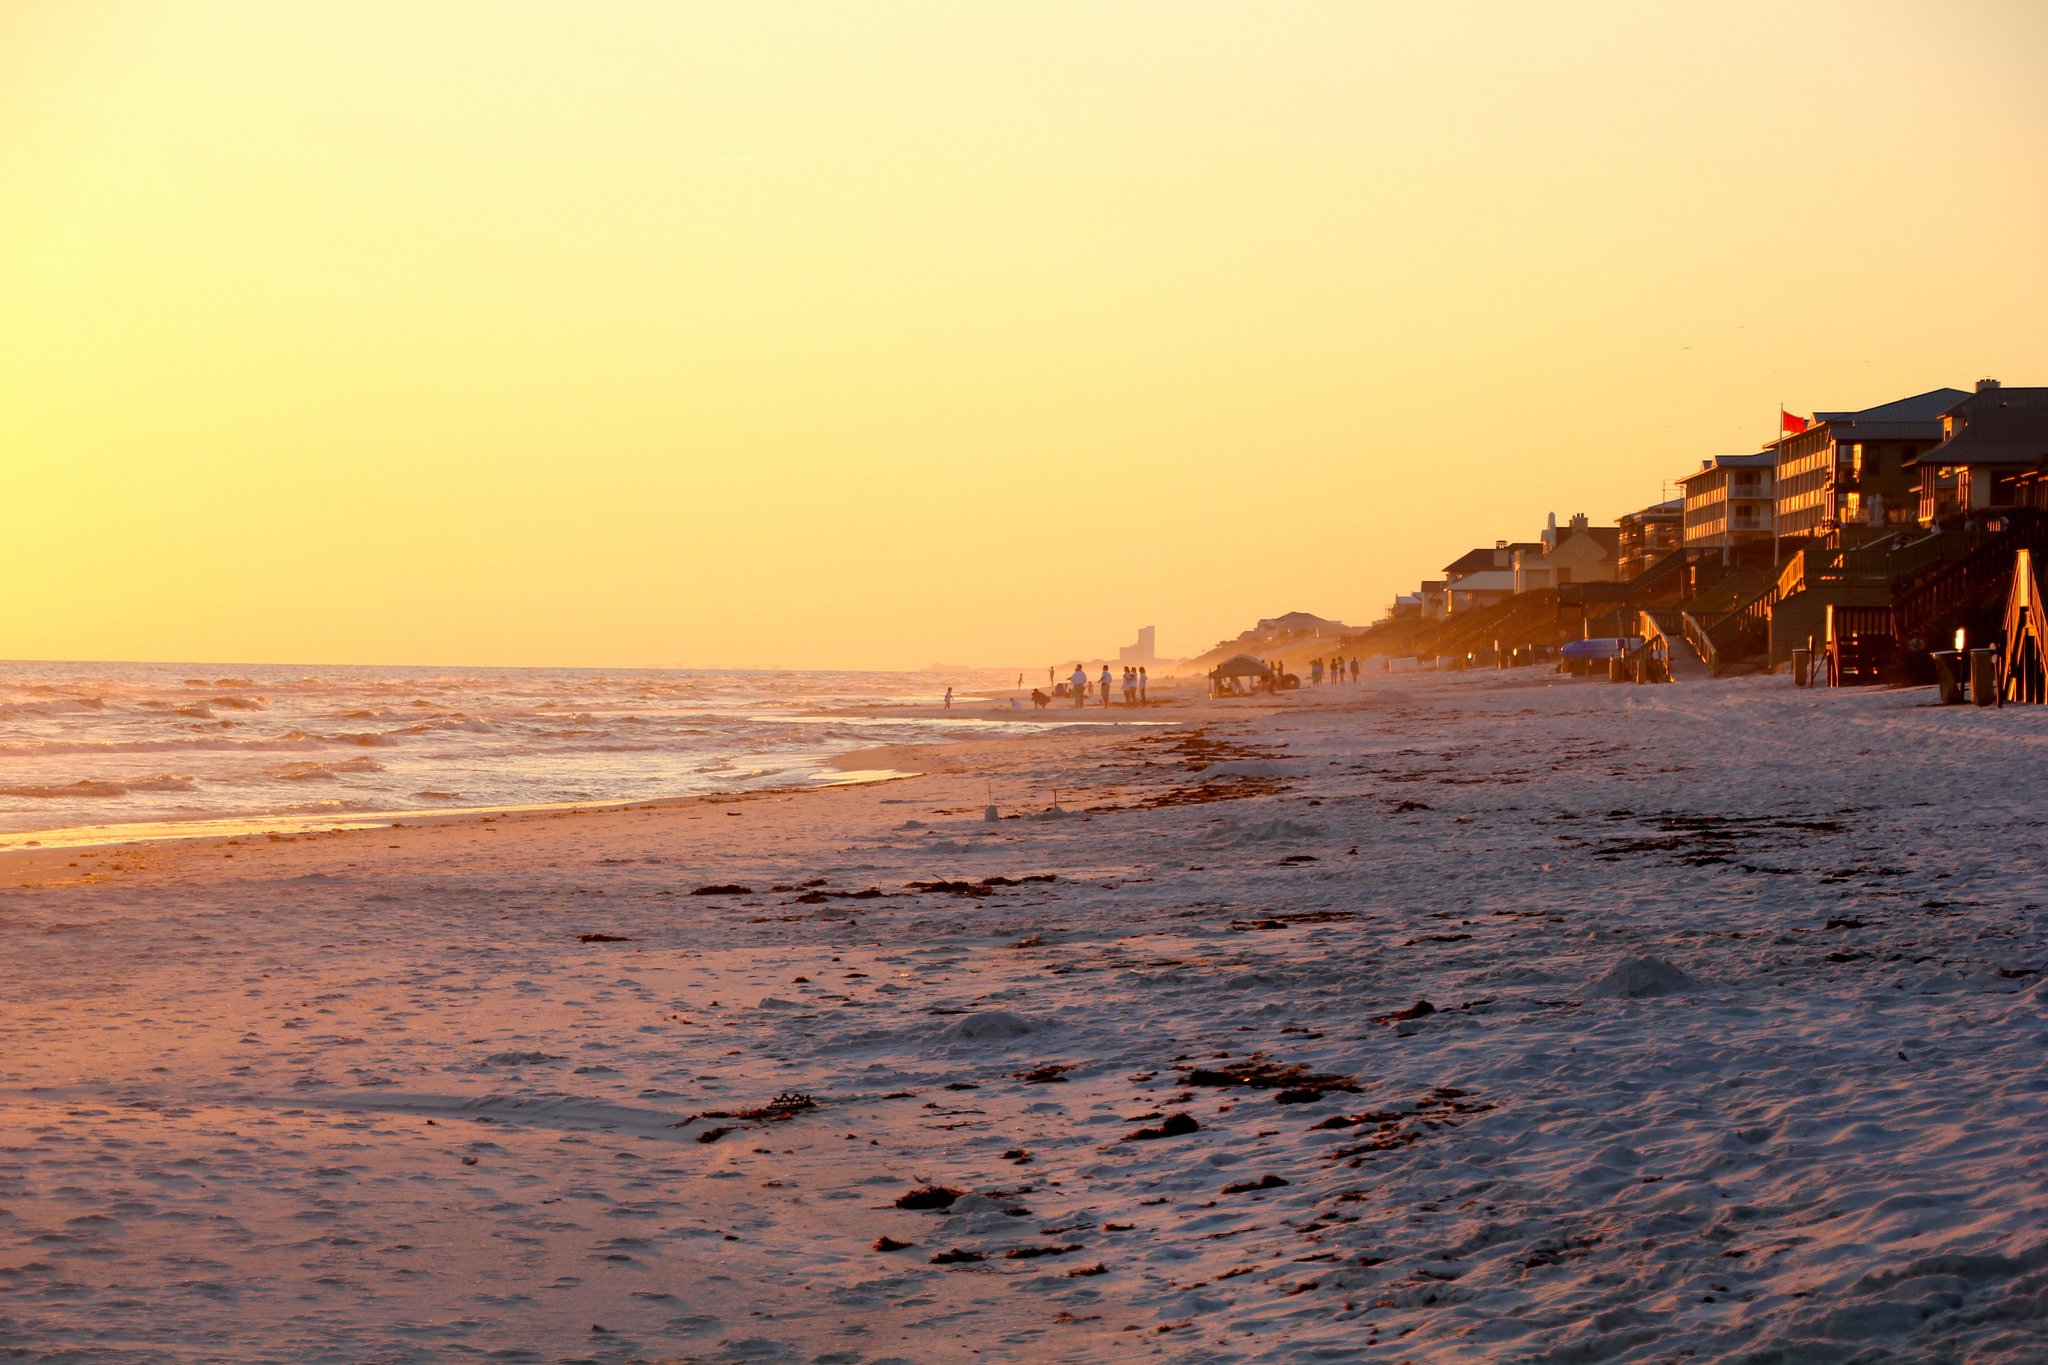 Rosemary Beach, Celesta Buchanan